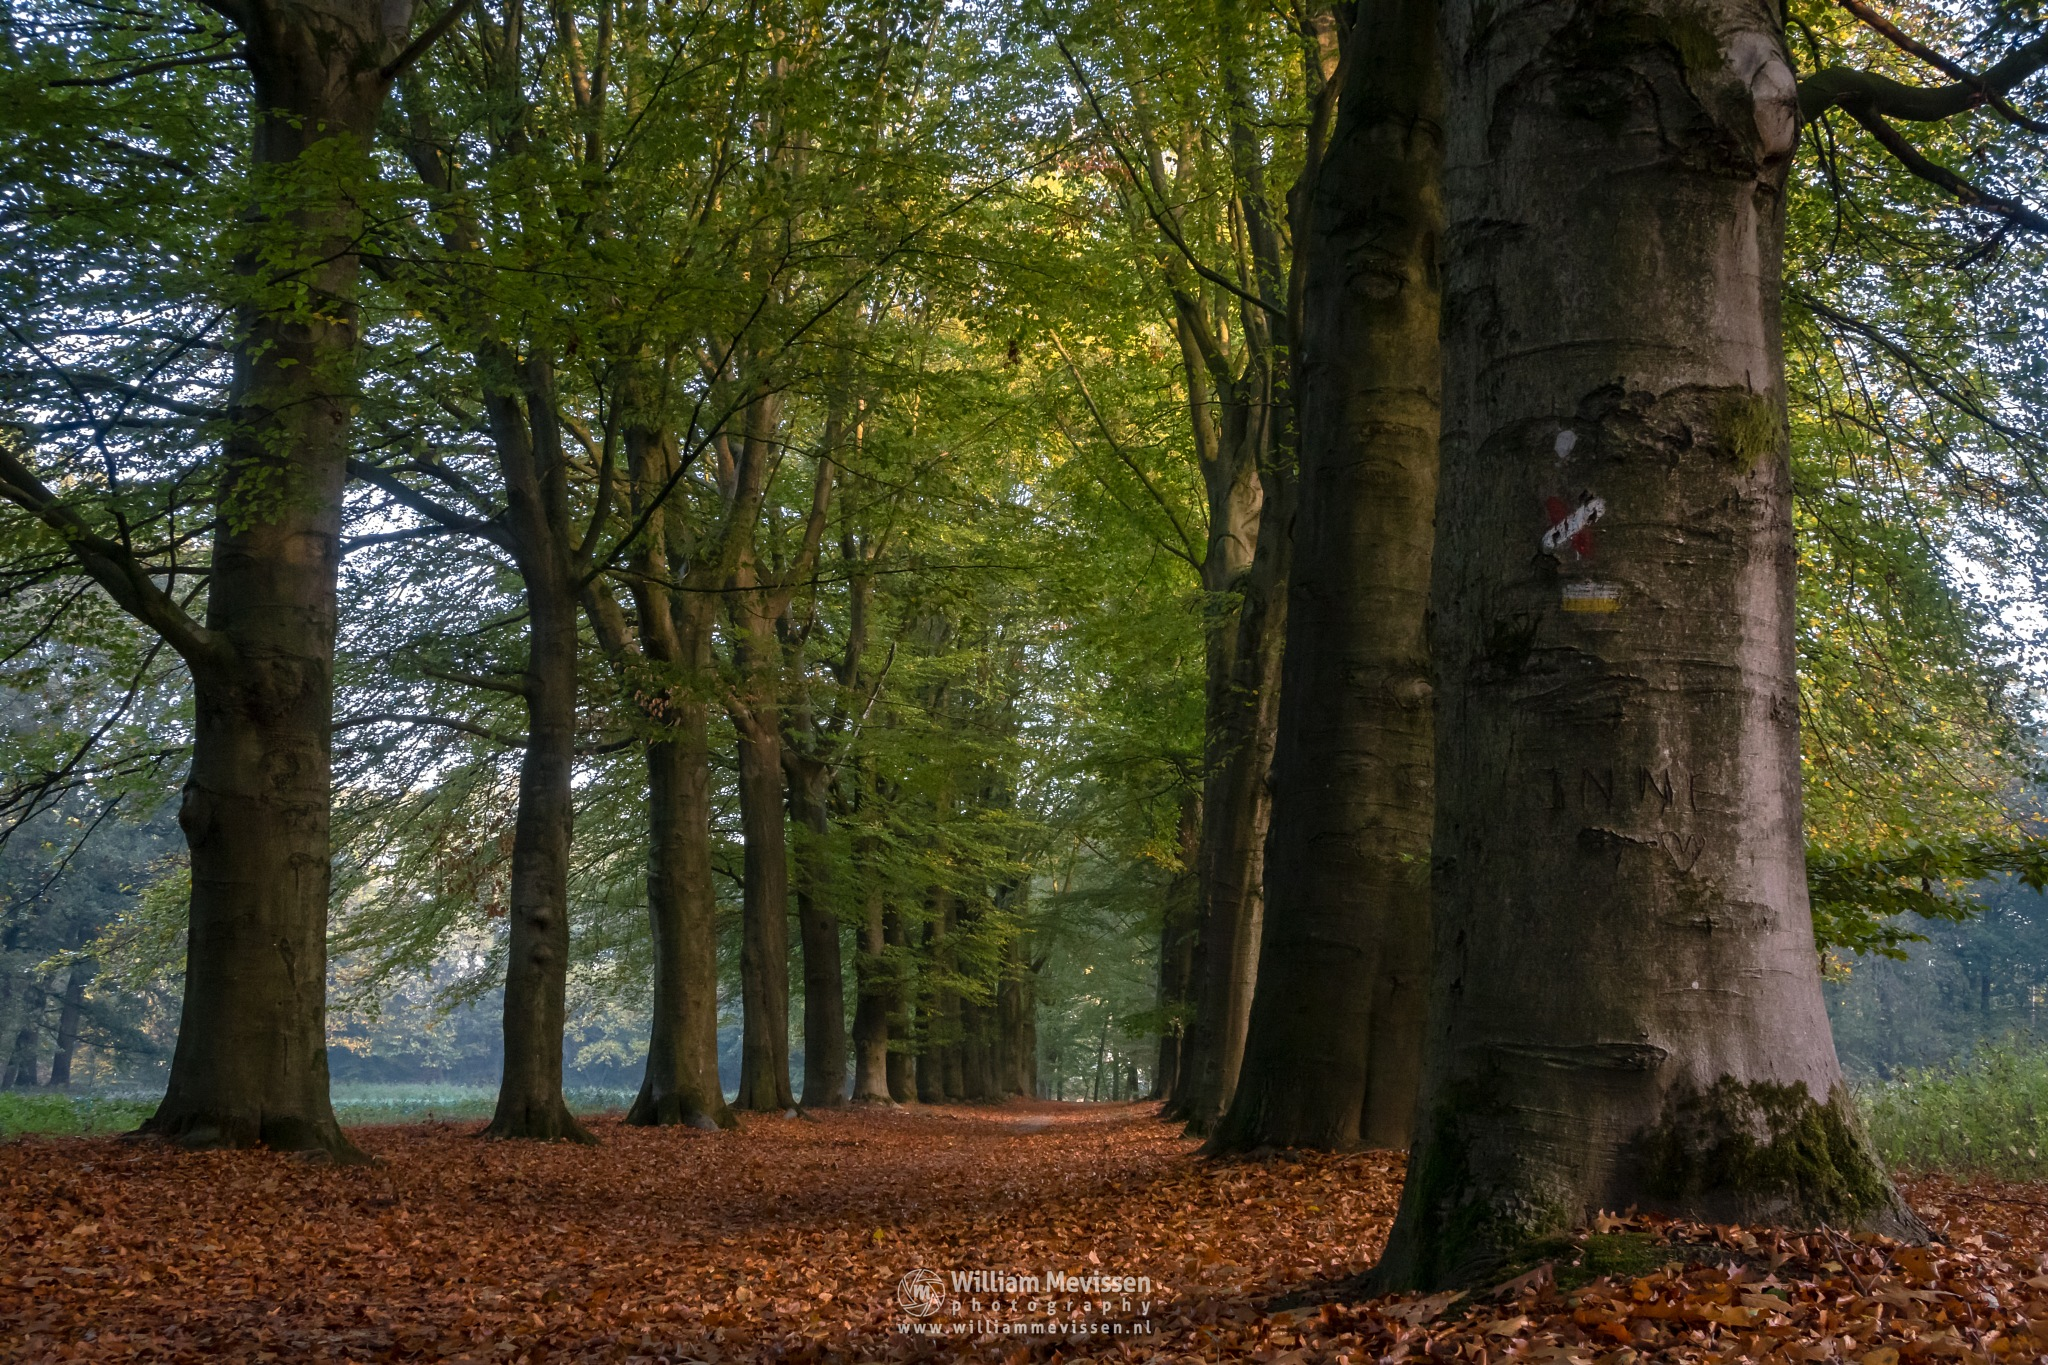 Autumn Mood Geijsteren by William Mevissen